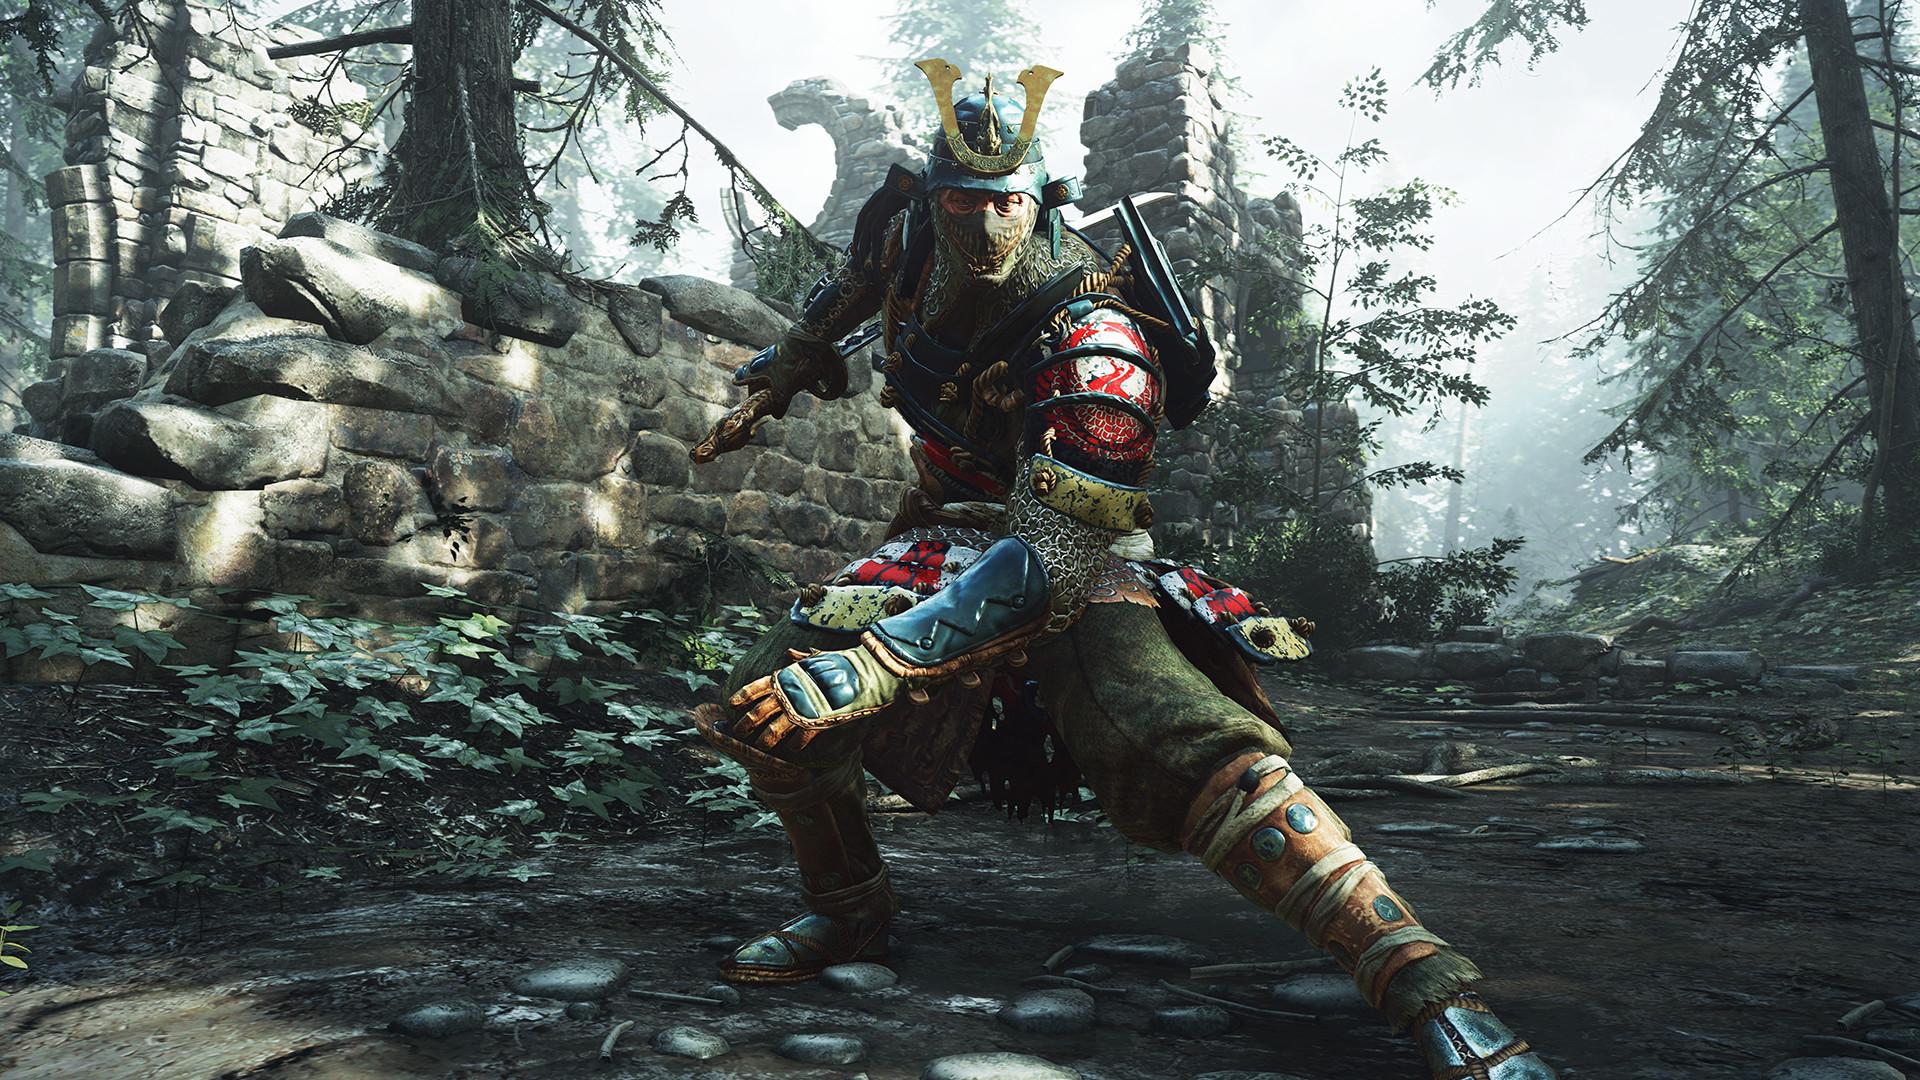 Video Game – For Honor For Honor (Video Game) Samurai Bakgrund